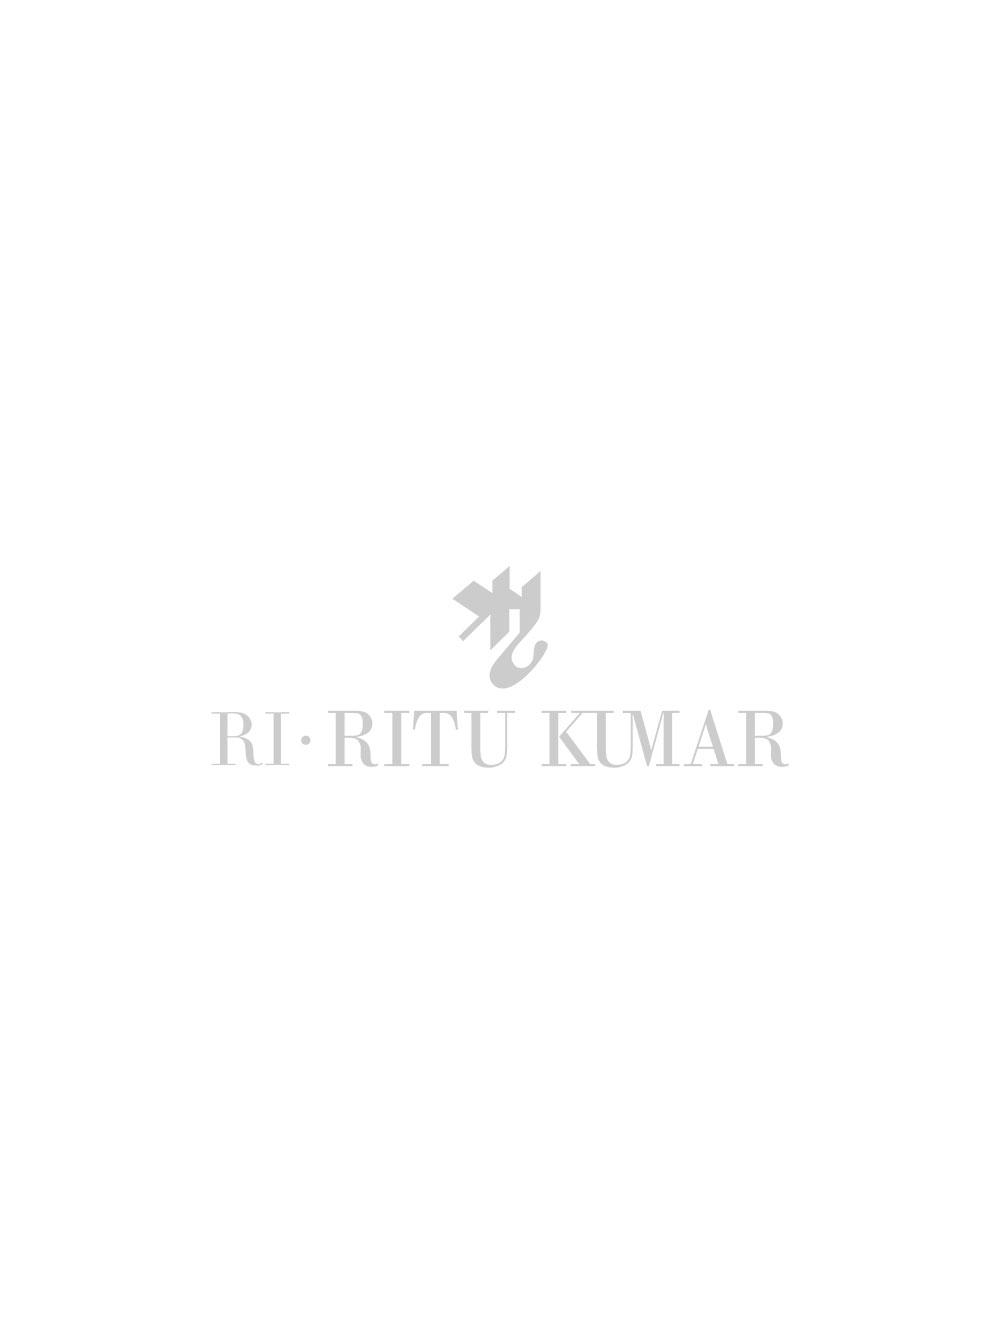 Royal Blue Embroidered Kurta With Dupatta And Salwar